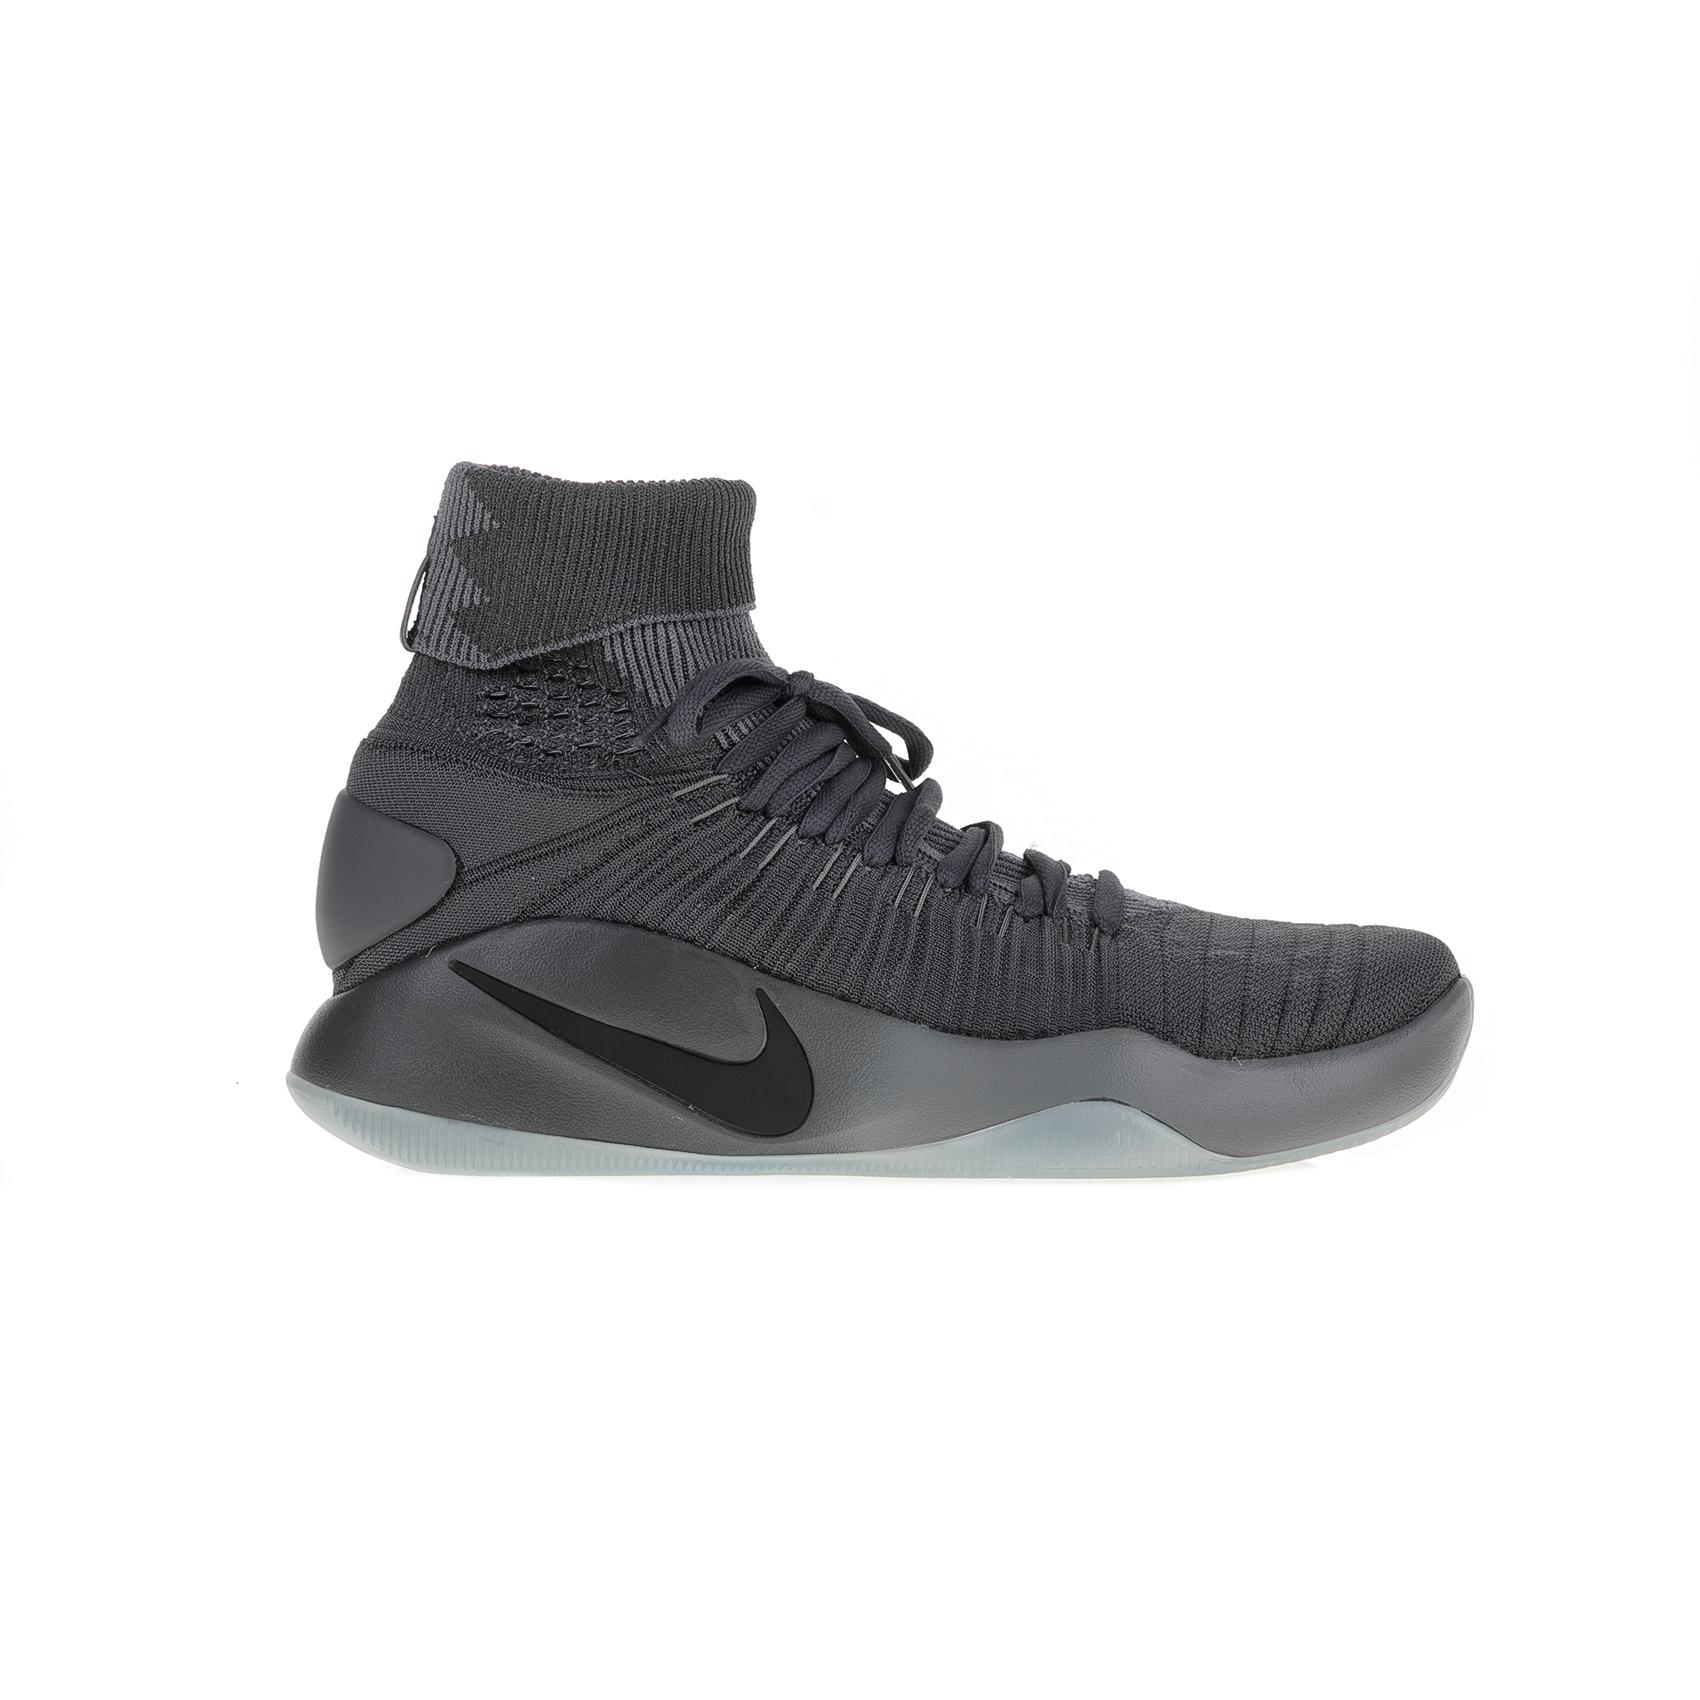 NIKE – Ανδρικά παπούτσια NIKE HYPERDUNK 2016 FK γκρι